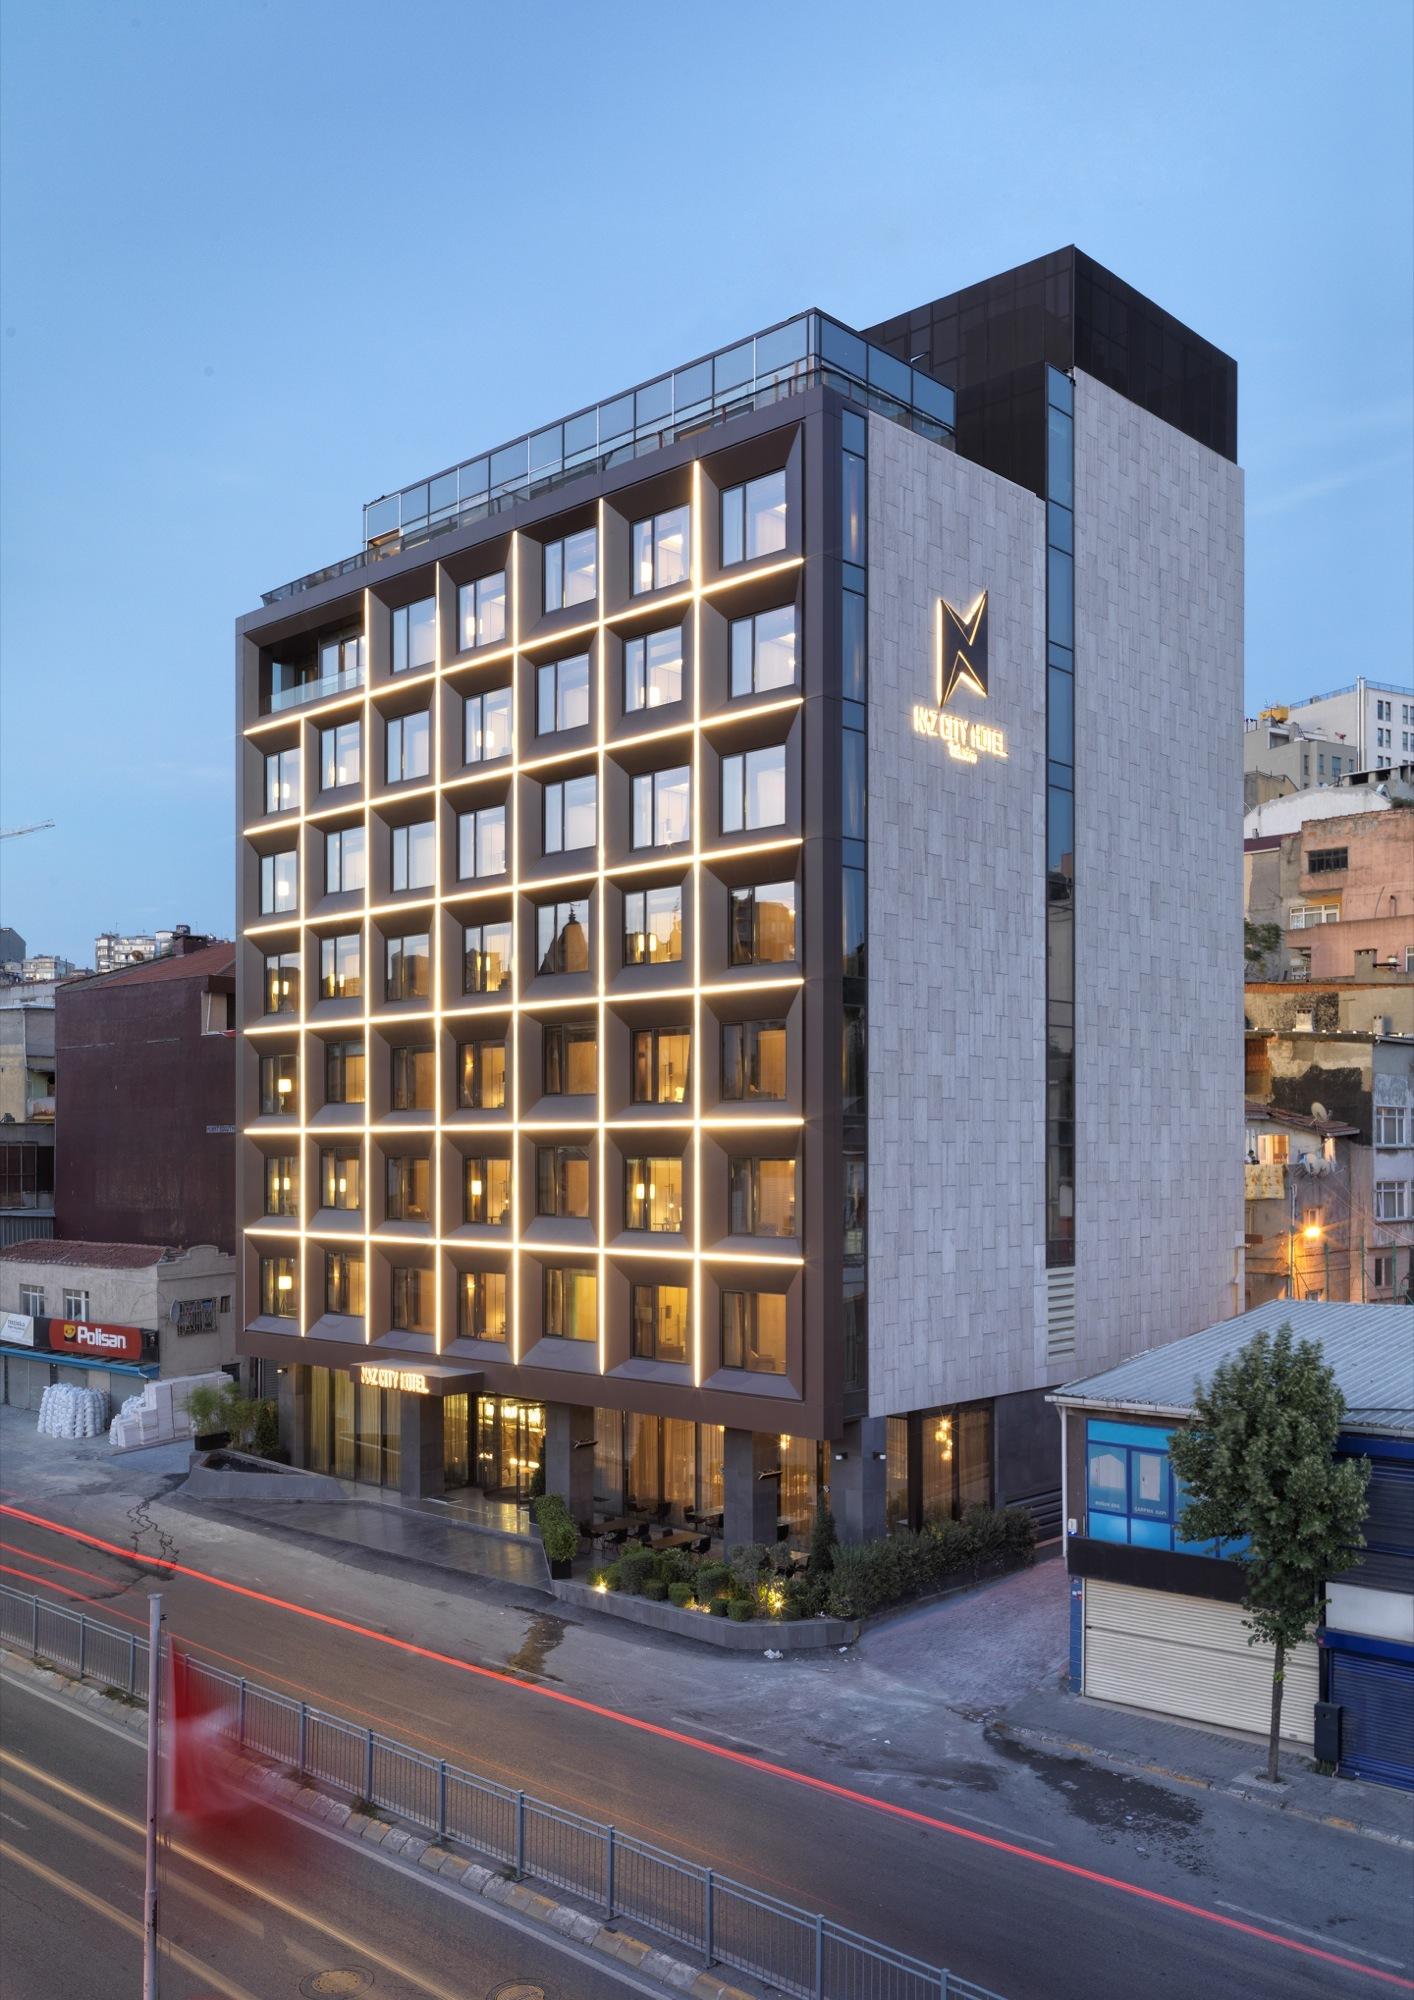 Naz City Hotel Taksim Metex Design Group Archdaily